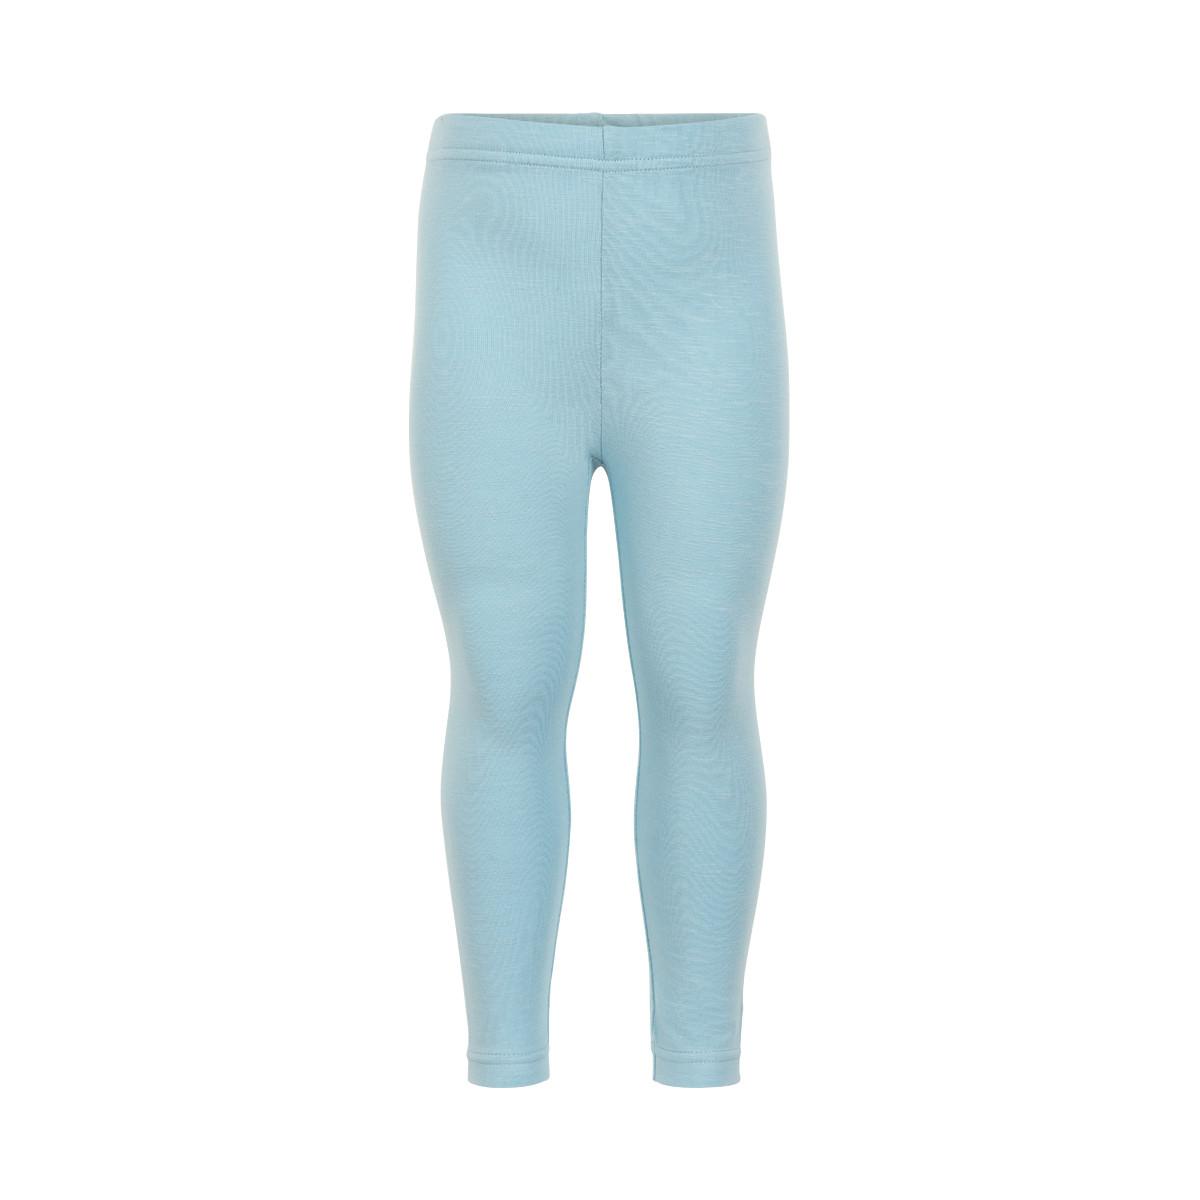 Minymo | Legging | 3-6y | 121053T-7841